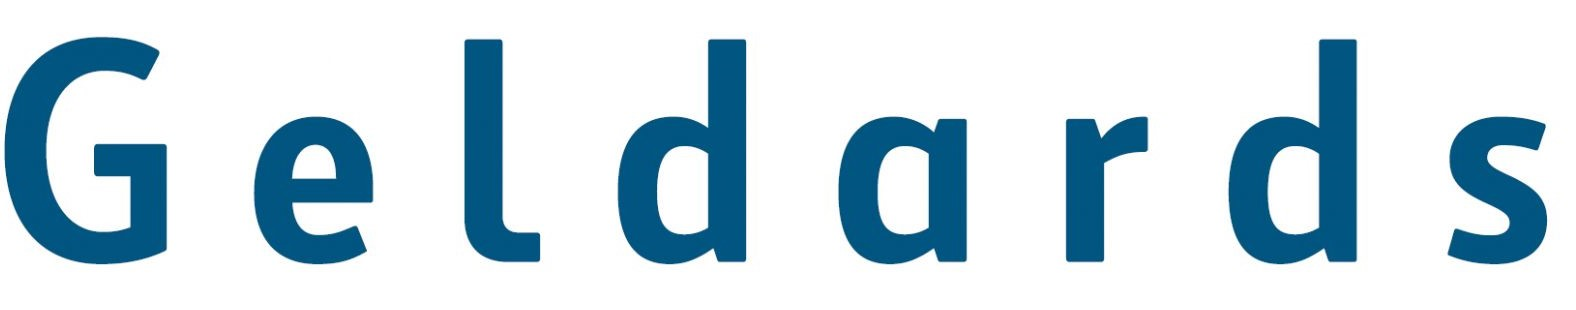 Geldards LLP, http://www.iblc.com/images/firmlogos/GeldardsLogo.jpg Logo